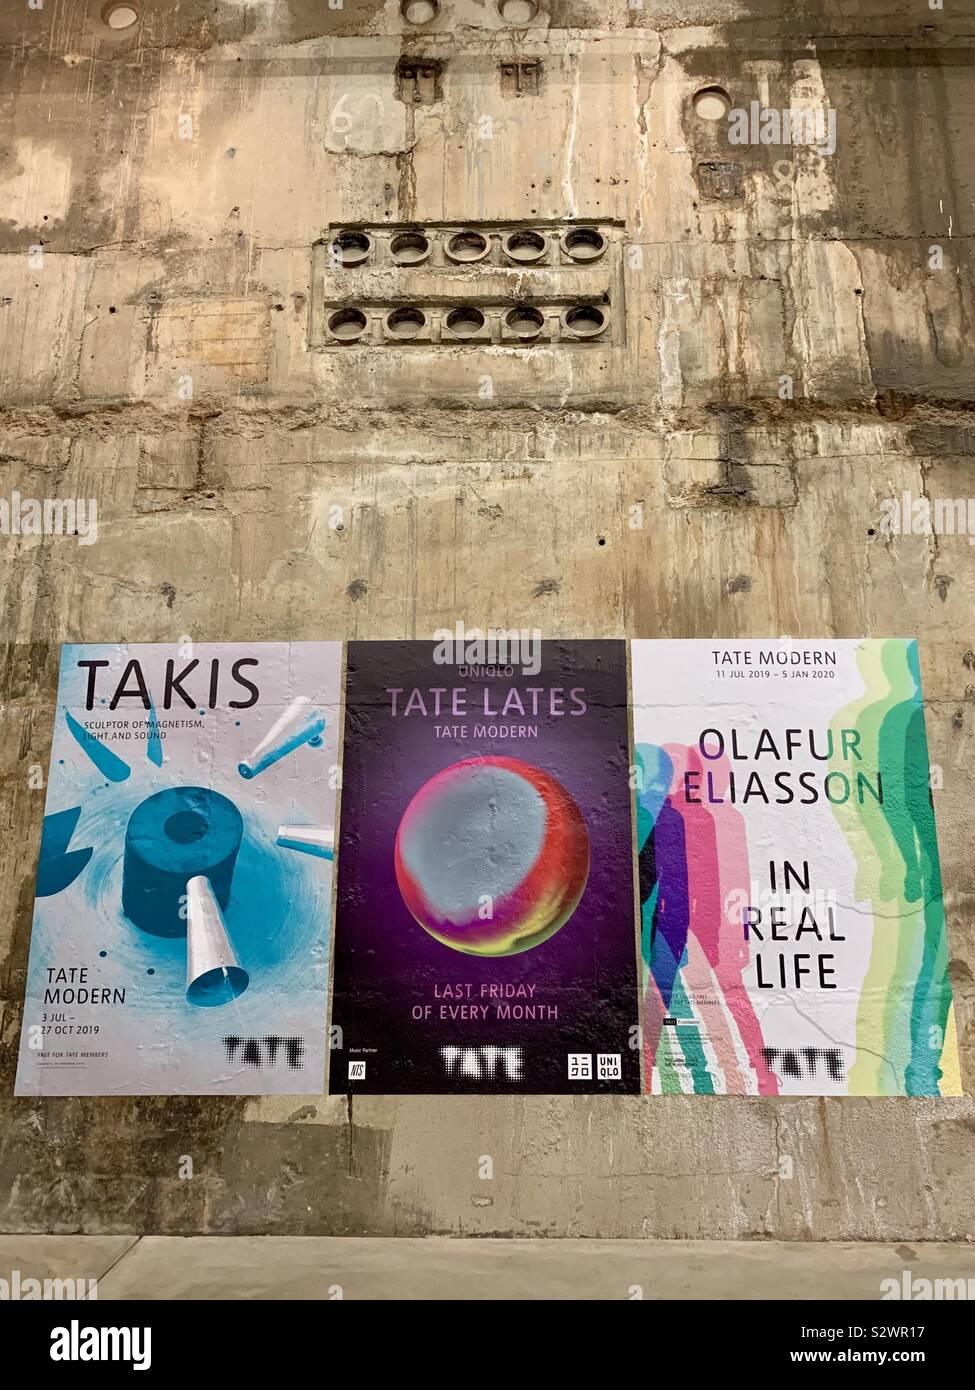 London, UK - 29 August 2019: Posters inside Tate Modern